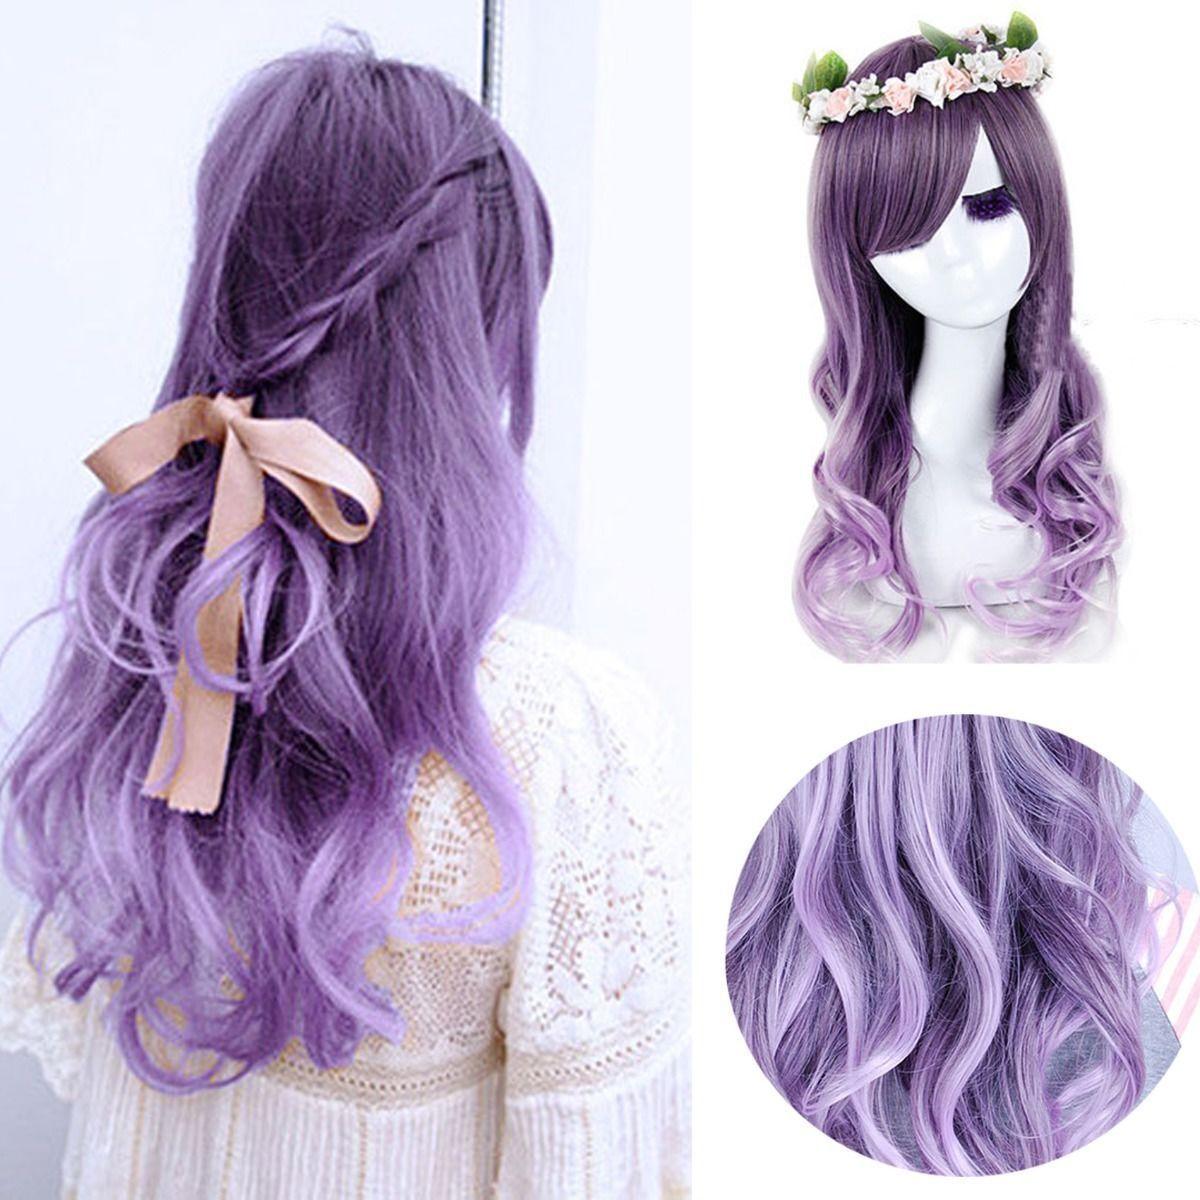 Cosplay Mori Girl Wig Purple Ombre Lavender Hair Long